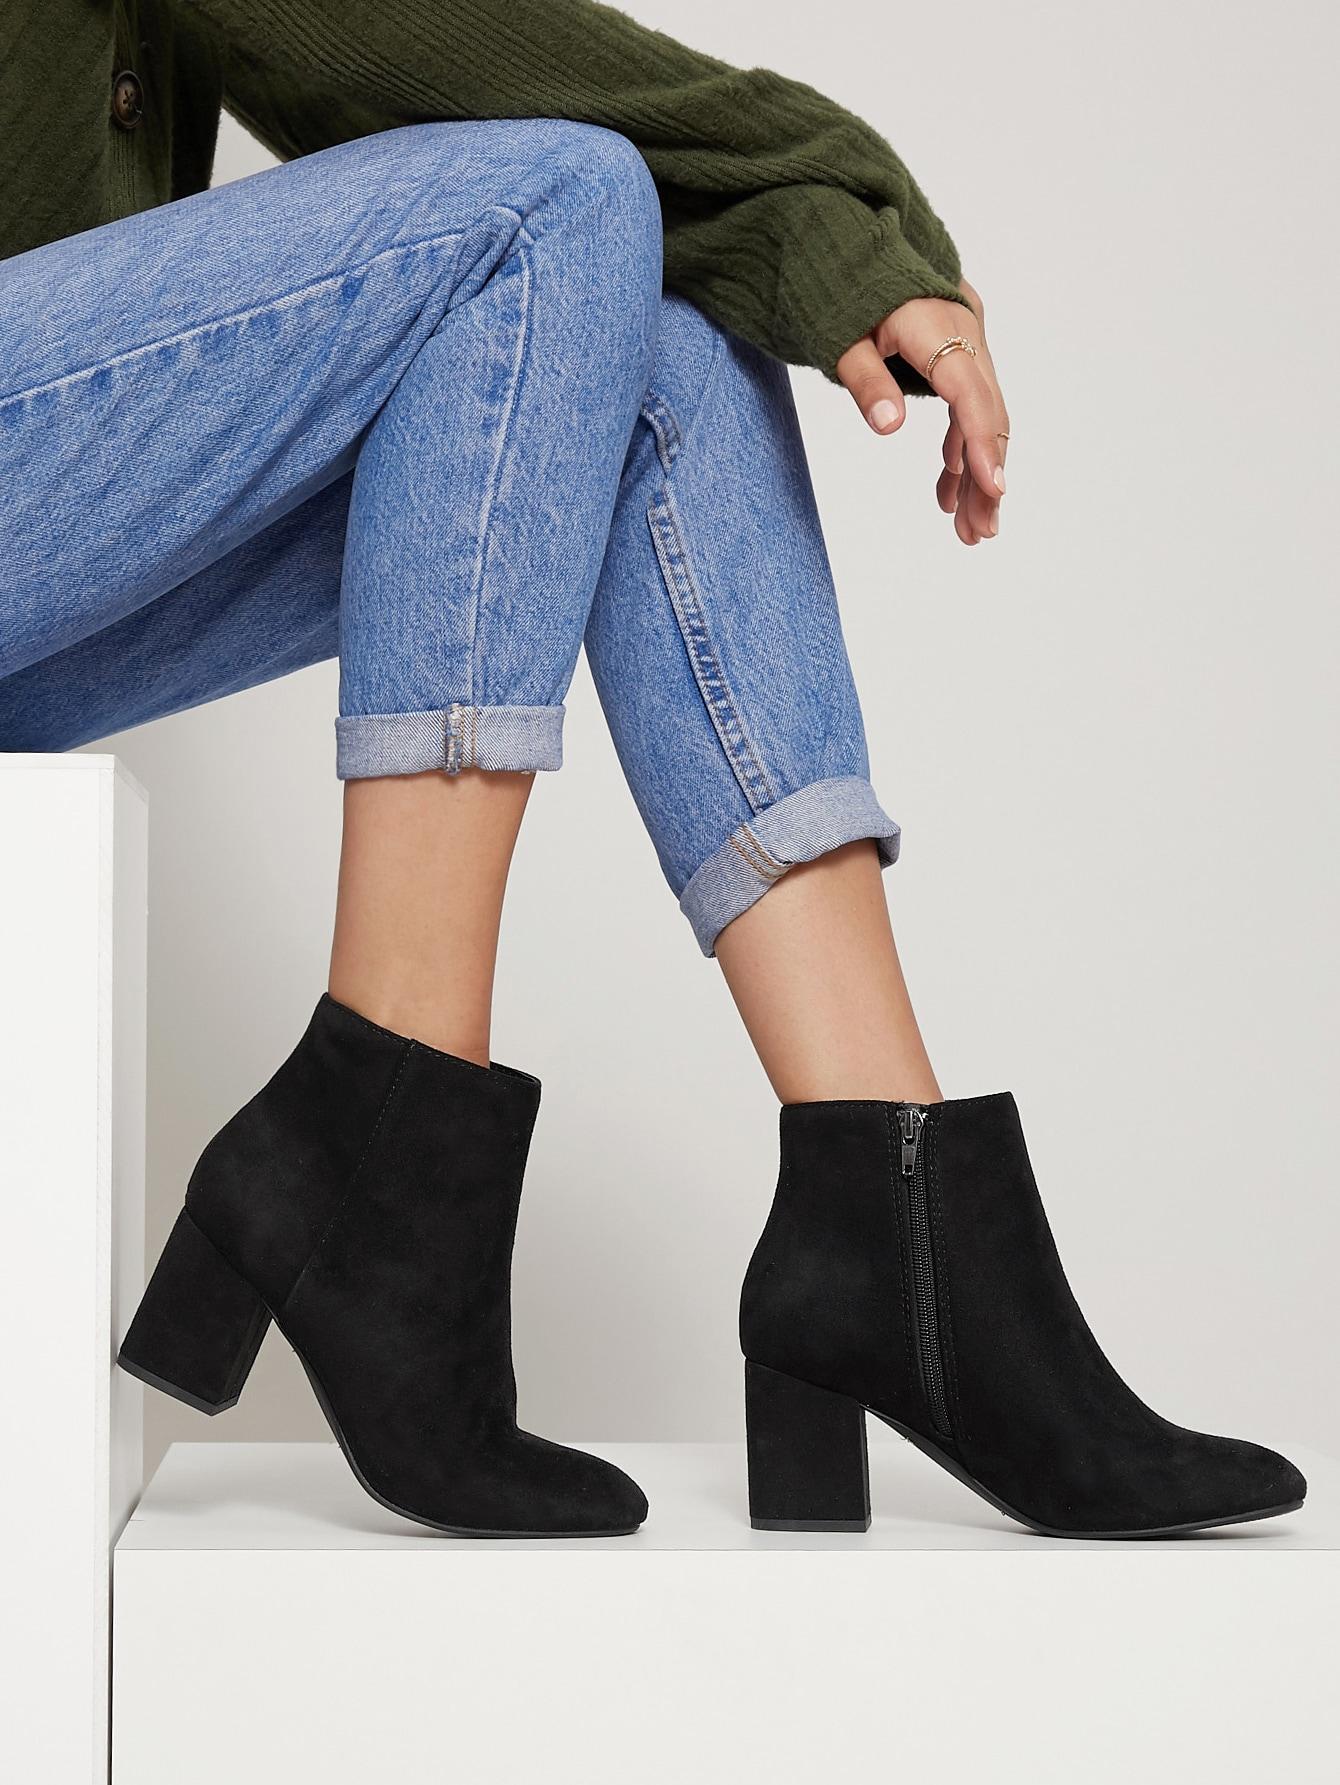 Faux Suede Block Heel Ankle Booties